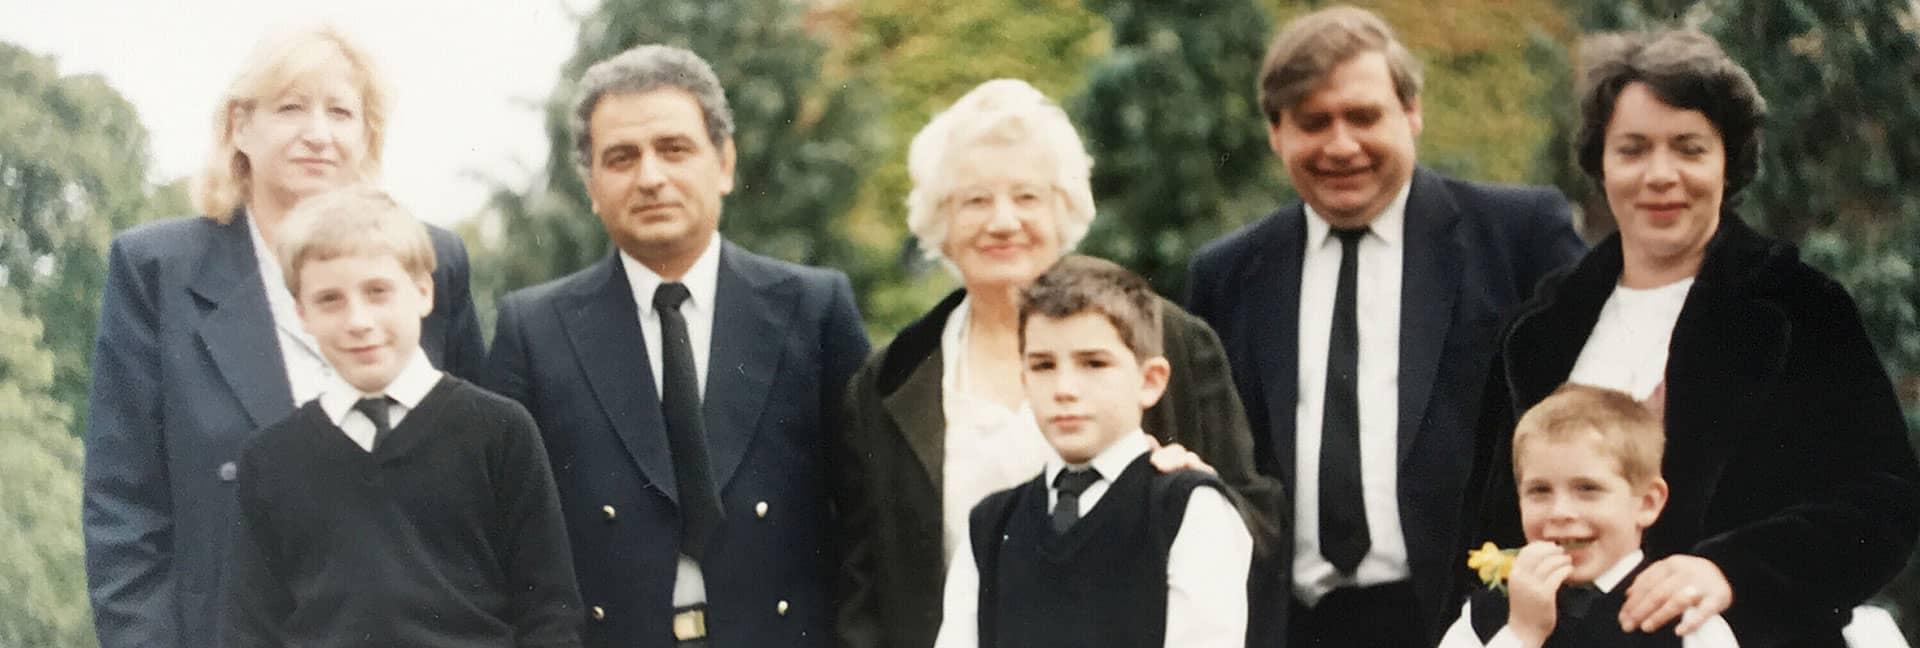 harper-family-photo